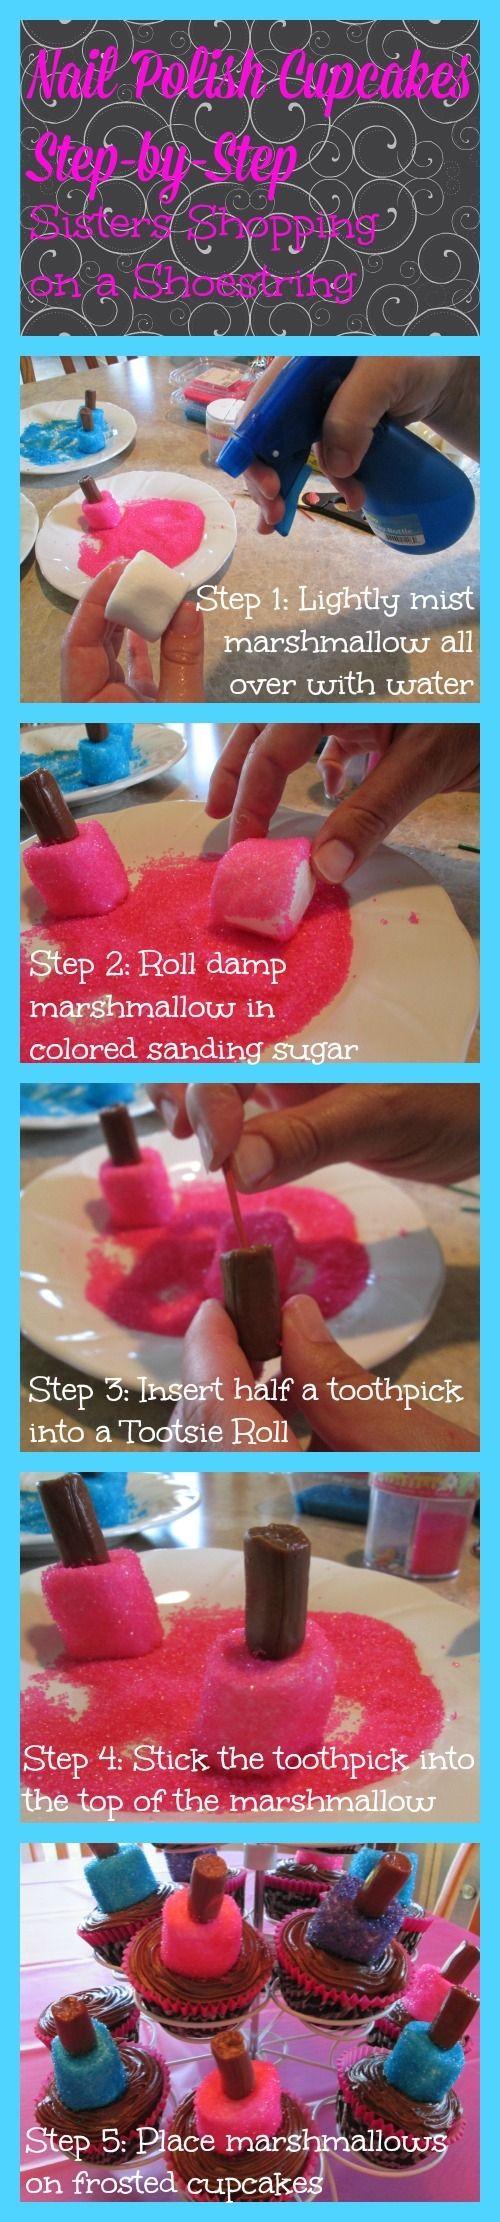 DIY Nail Polish Cupcakes desert cupcakes diy recipe recipes ingredients instructions desert recipes cake recipes easy recipes cakes cake art no bake food tutorial